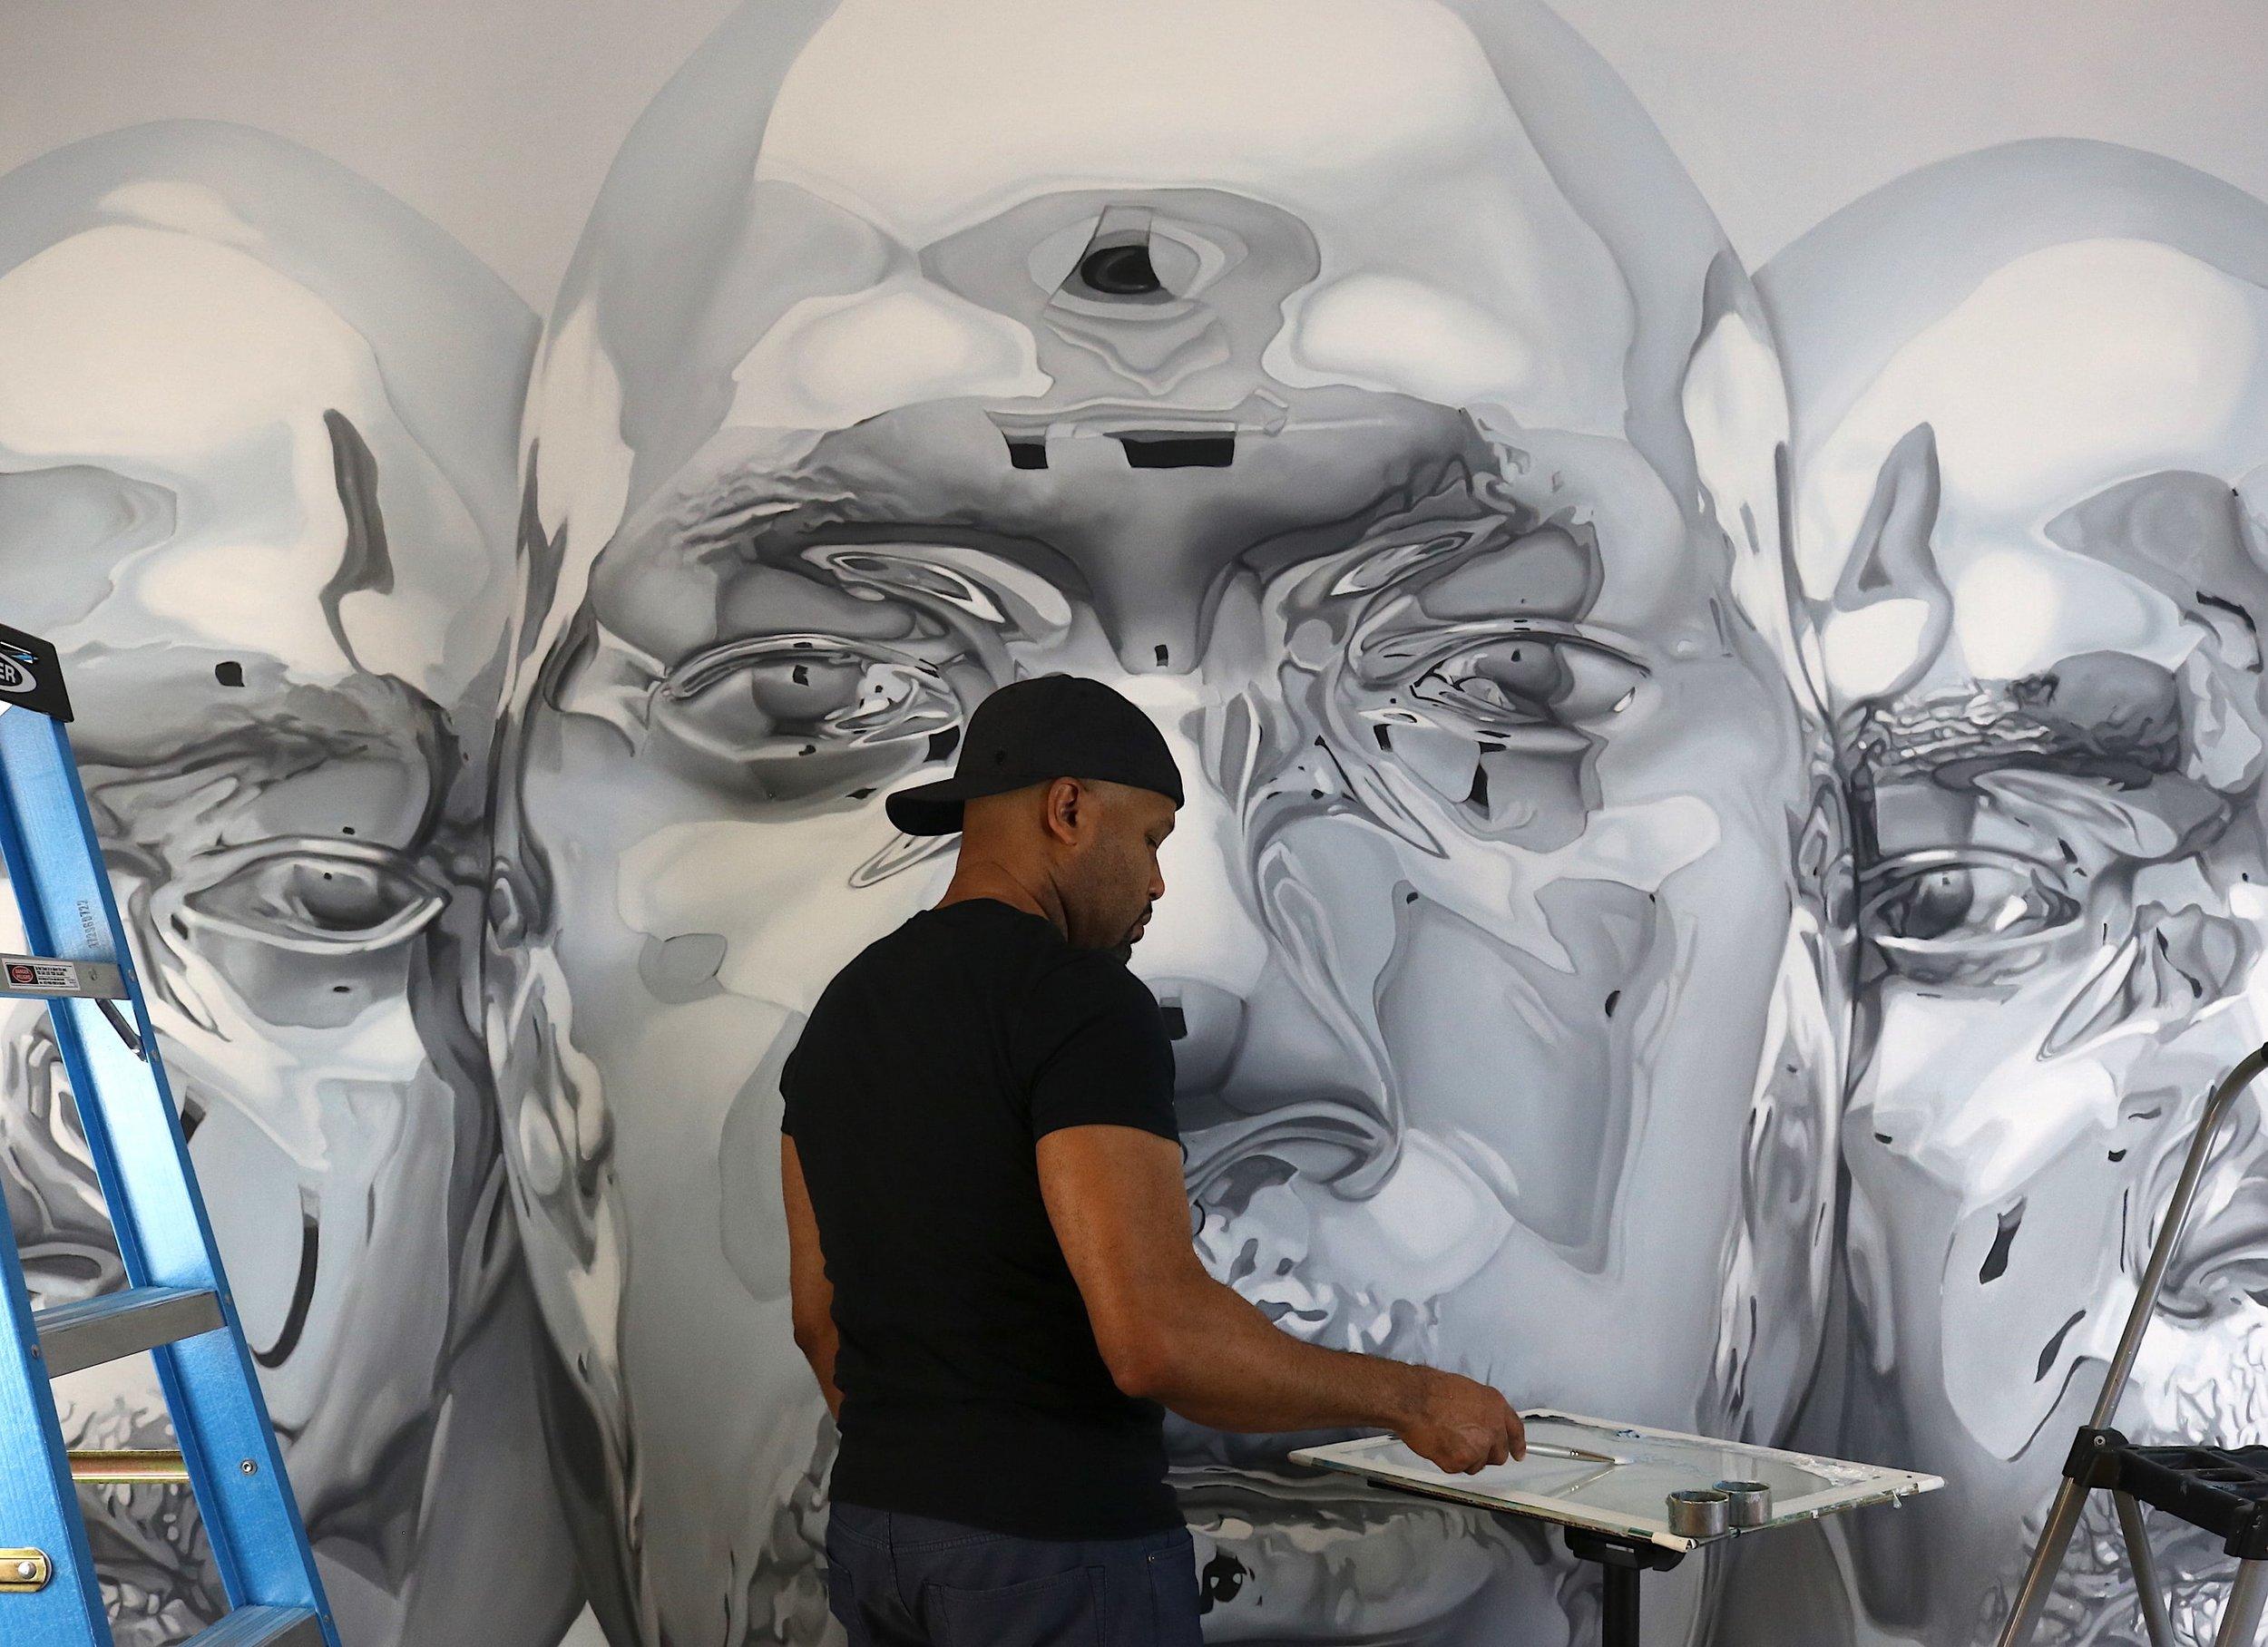 Kip Omolade painting 'Diovadiova Chrome Tribunal' (Oil on canvas, 120.5x156.5 in) © Kip Omolade.